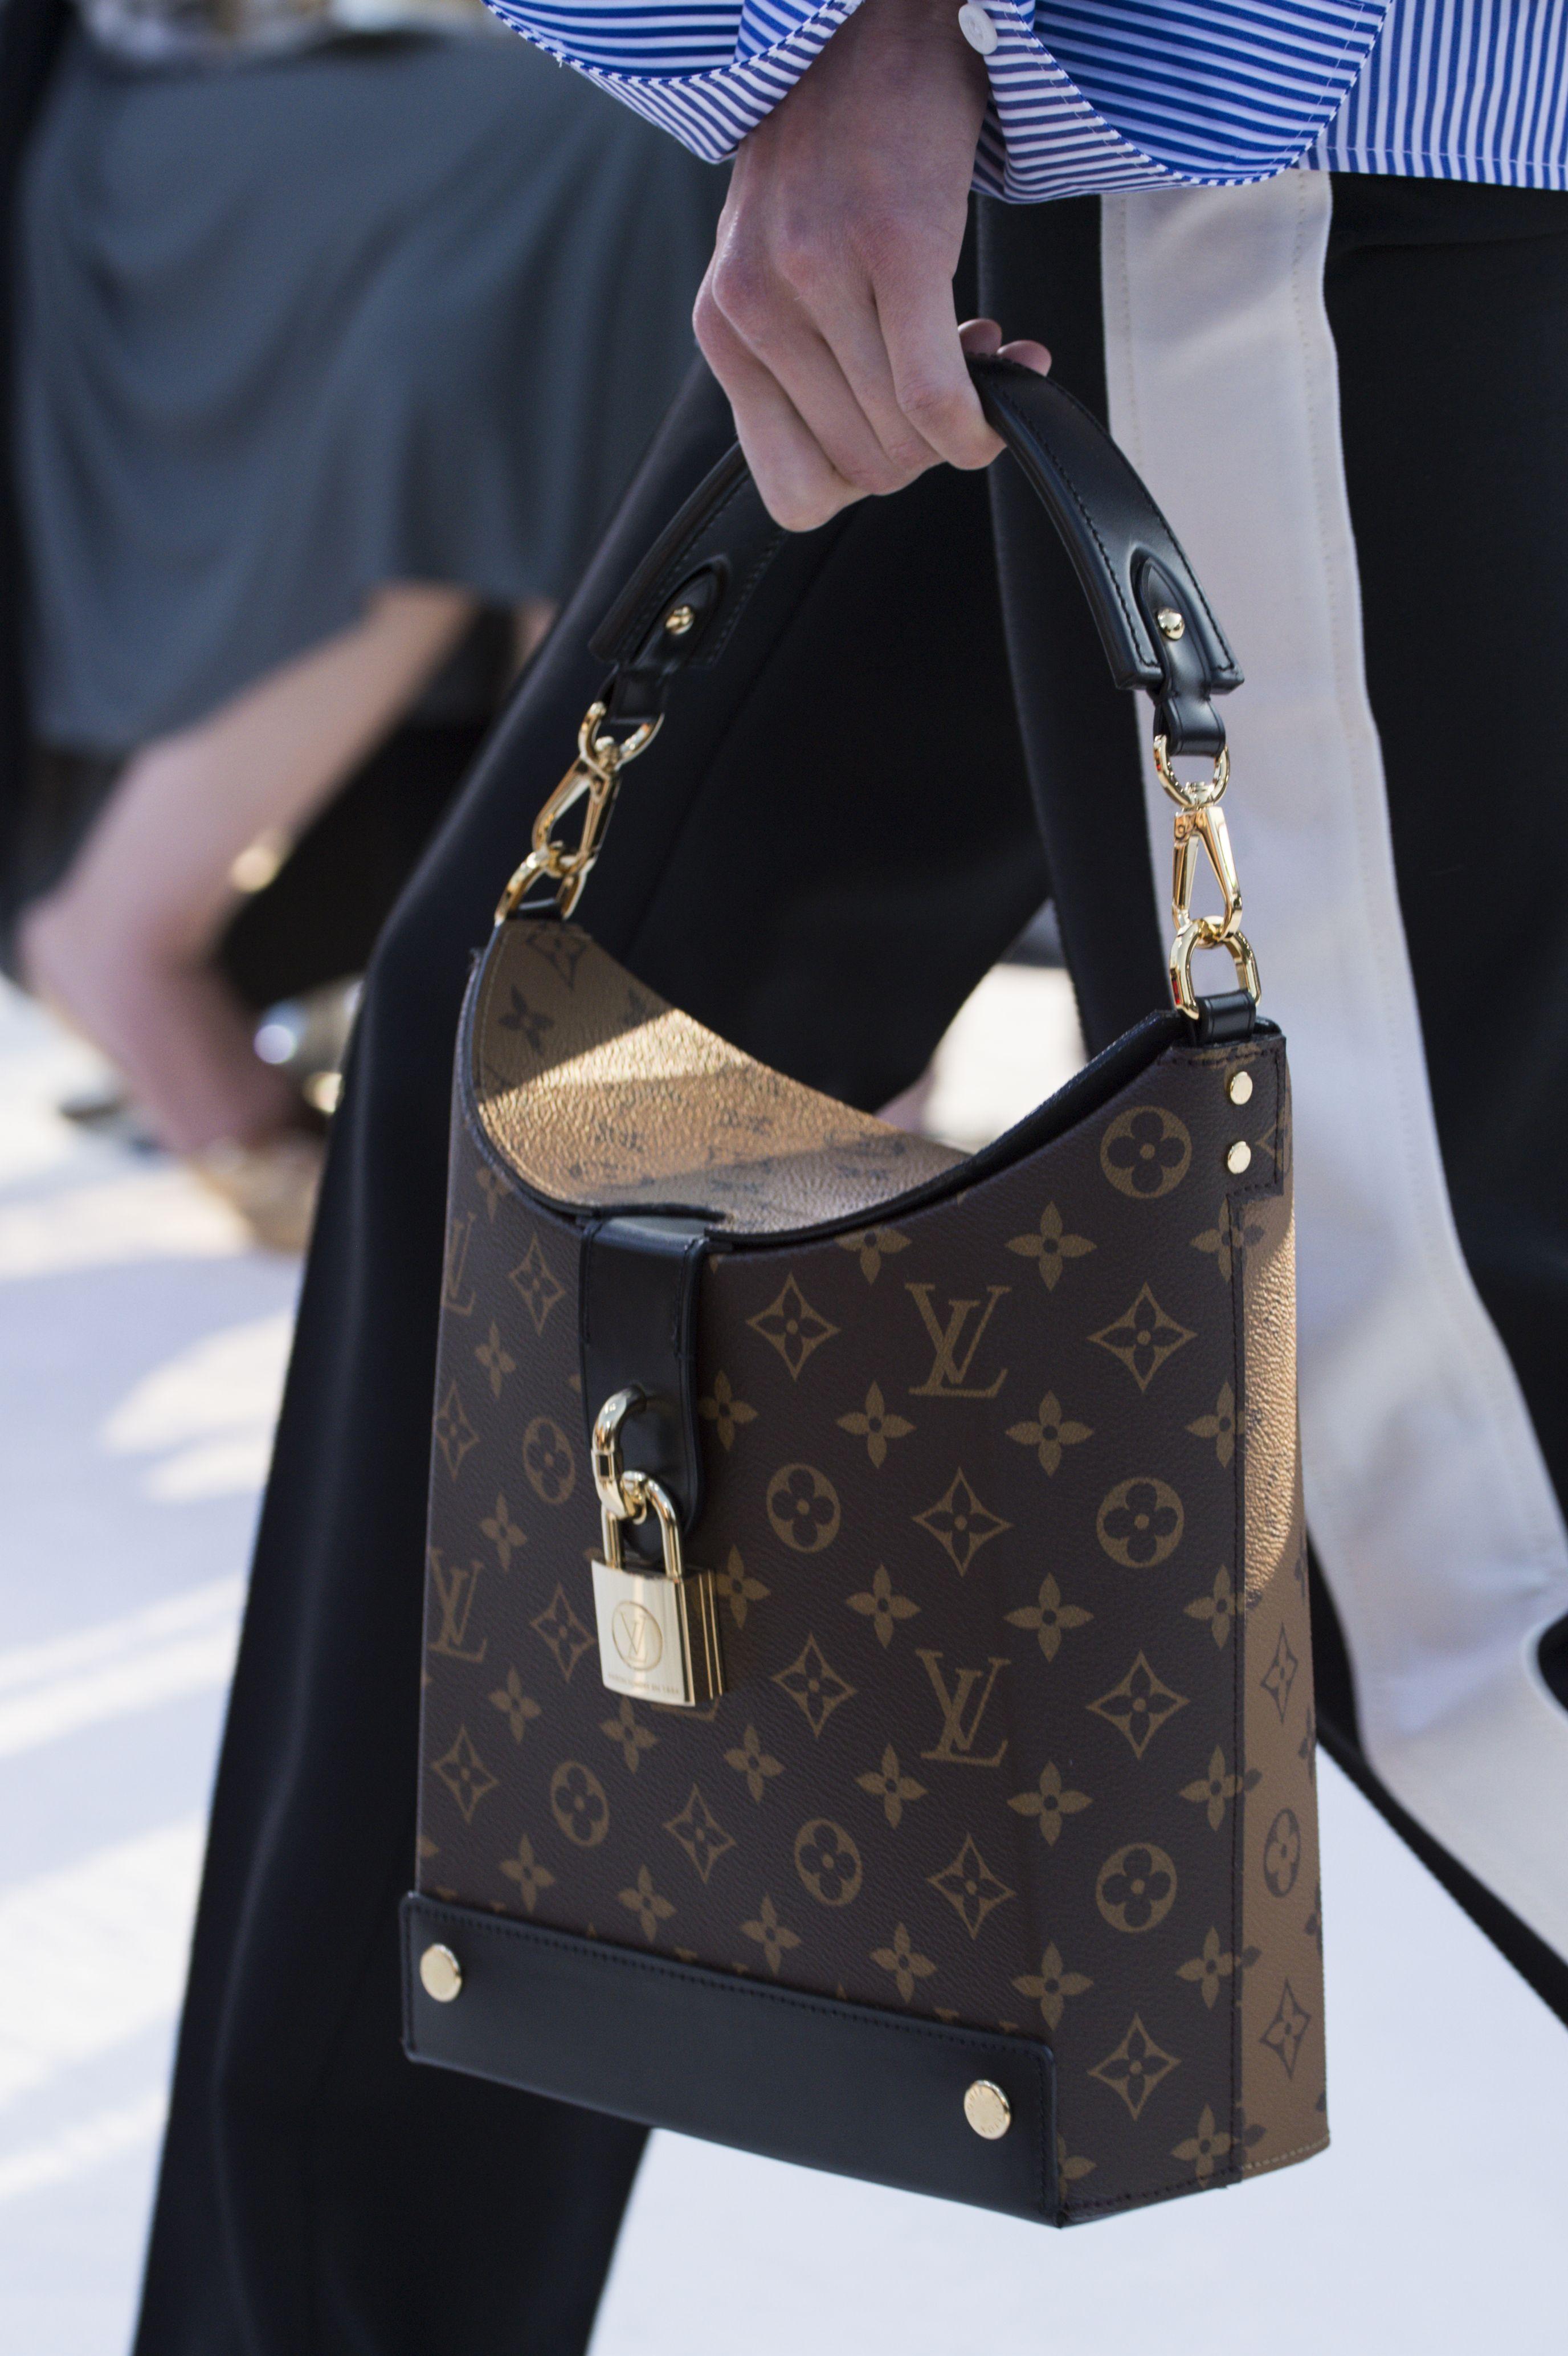 louis vuitton cruise 2017 bags. a closer look at bag from the louis vuitton cruise 2018 fashion show by nicolas 2017 bags p